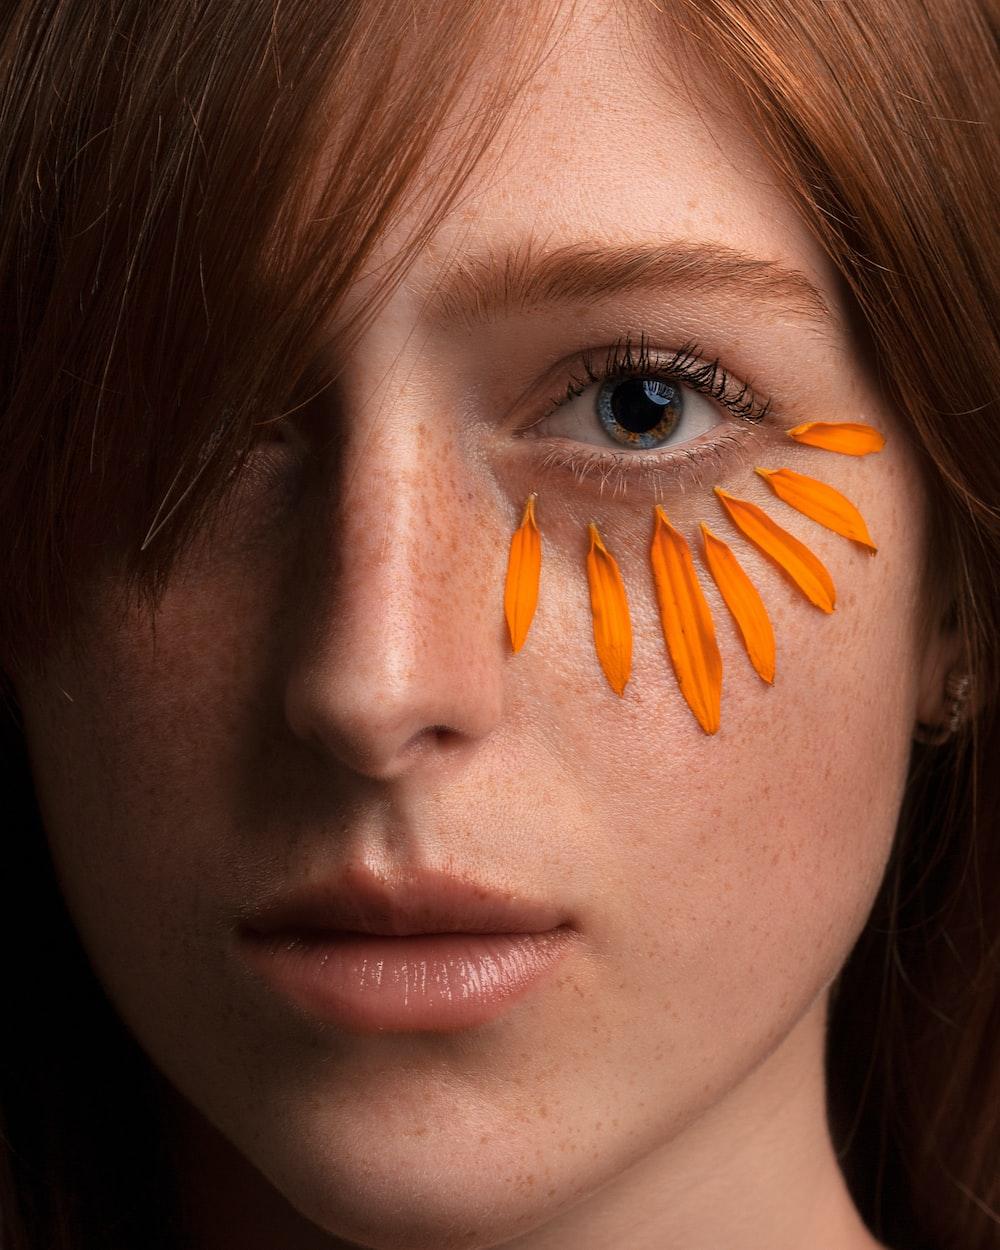 woman with orange hair clip